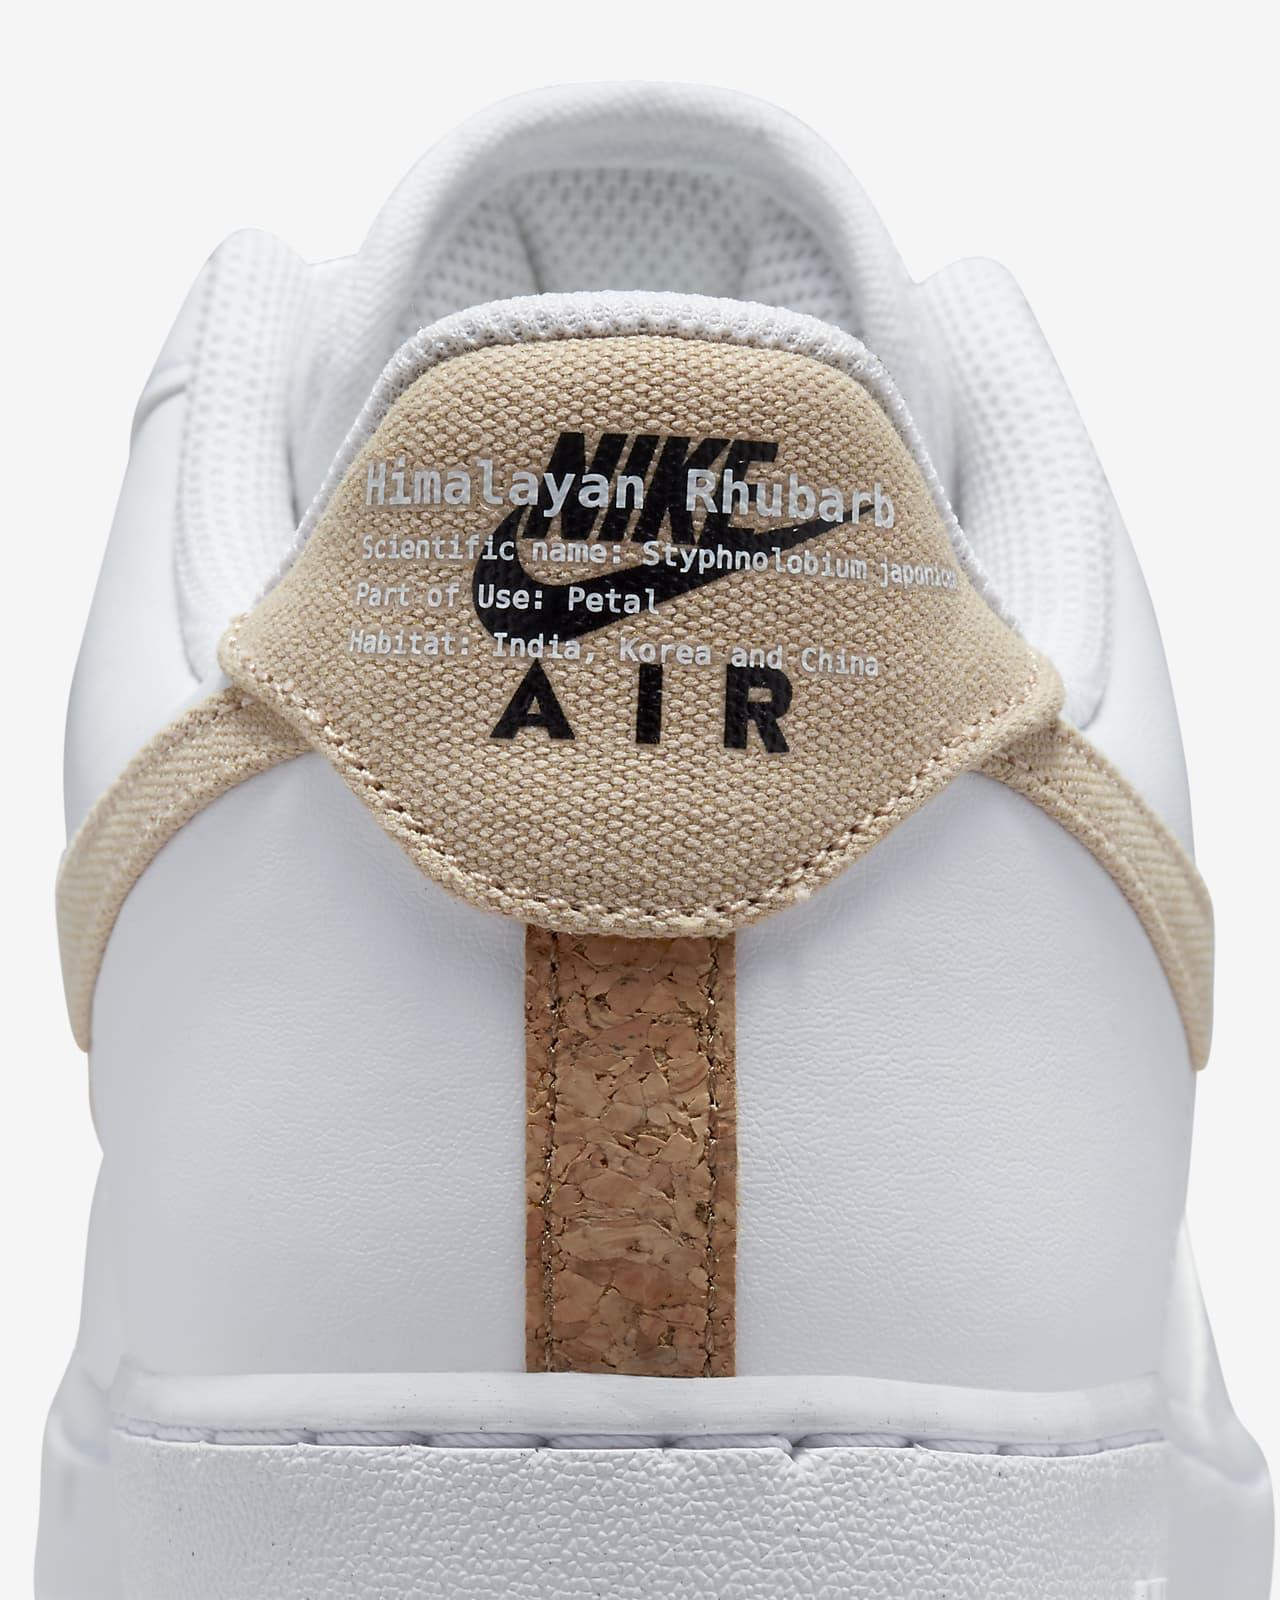 Chaussure Nike Air Force 1 '07 LV8. Nike LU